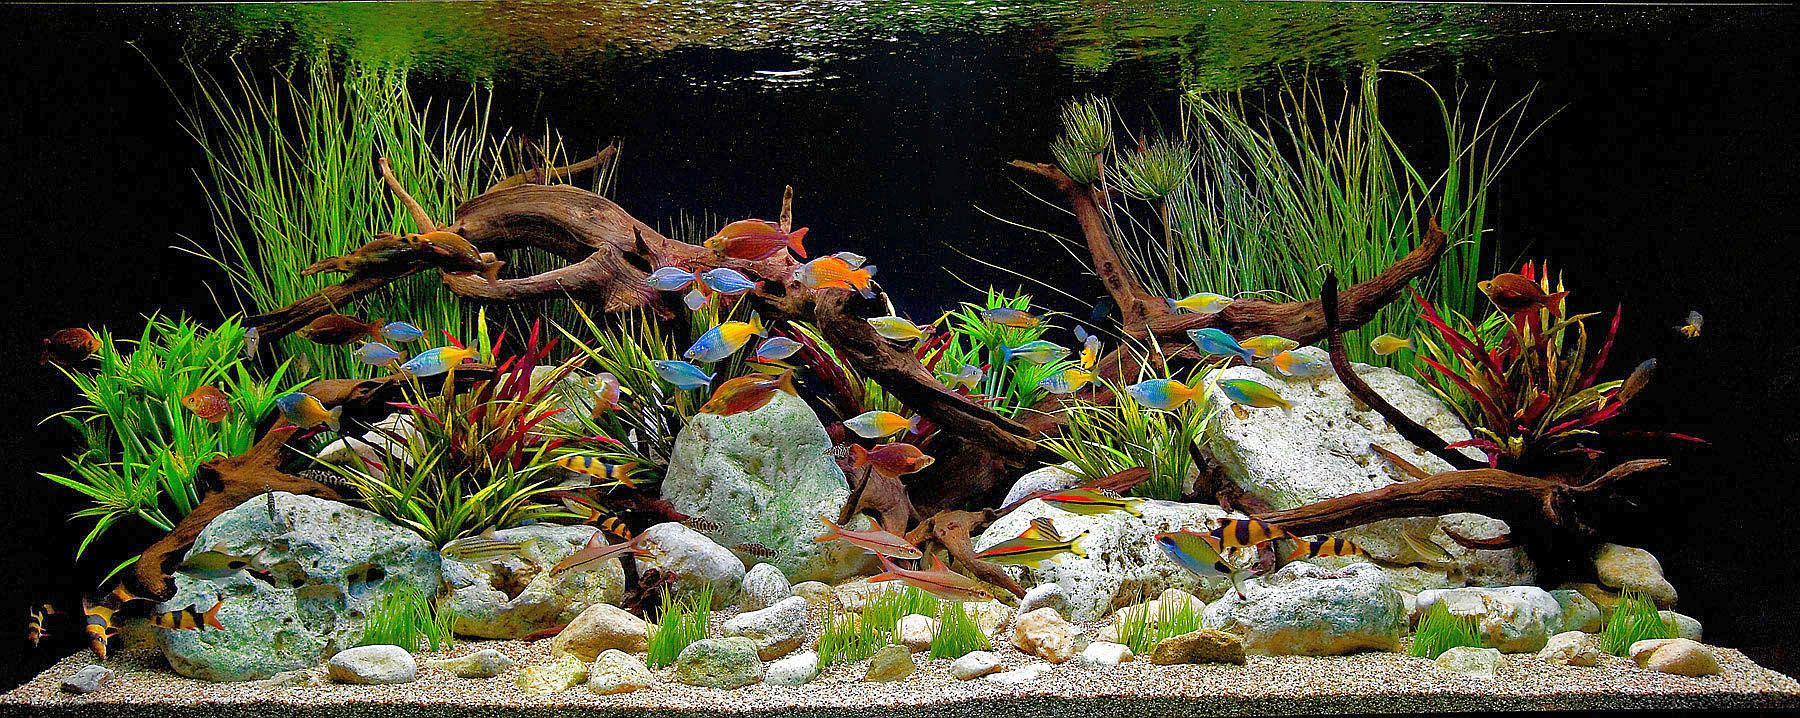 Freshwater Tropical Aquarium Fish